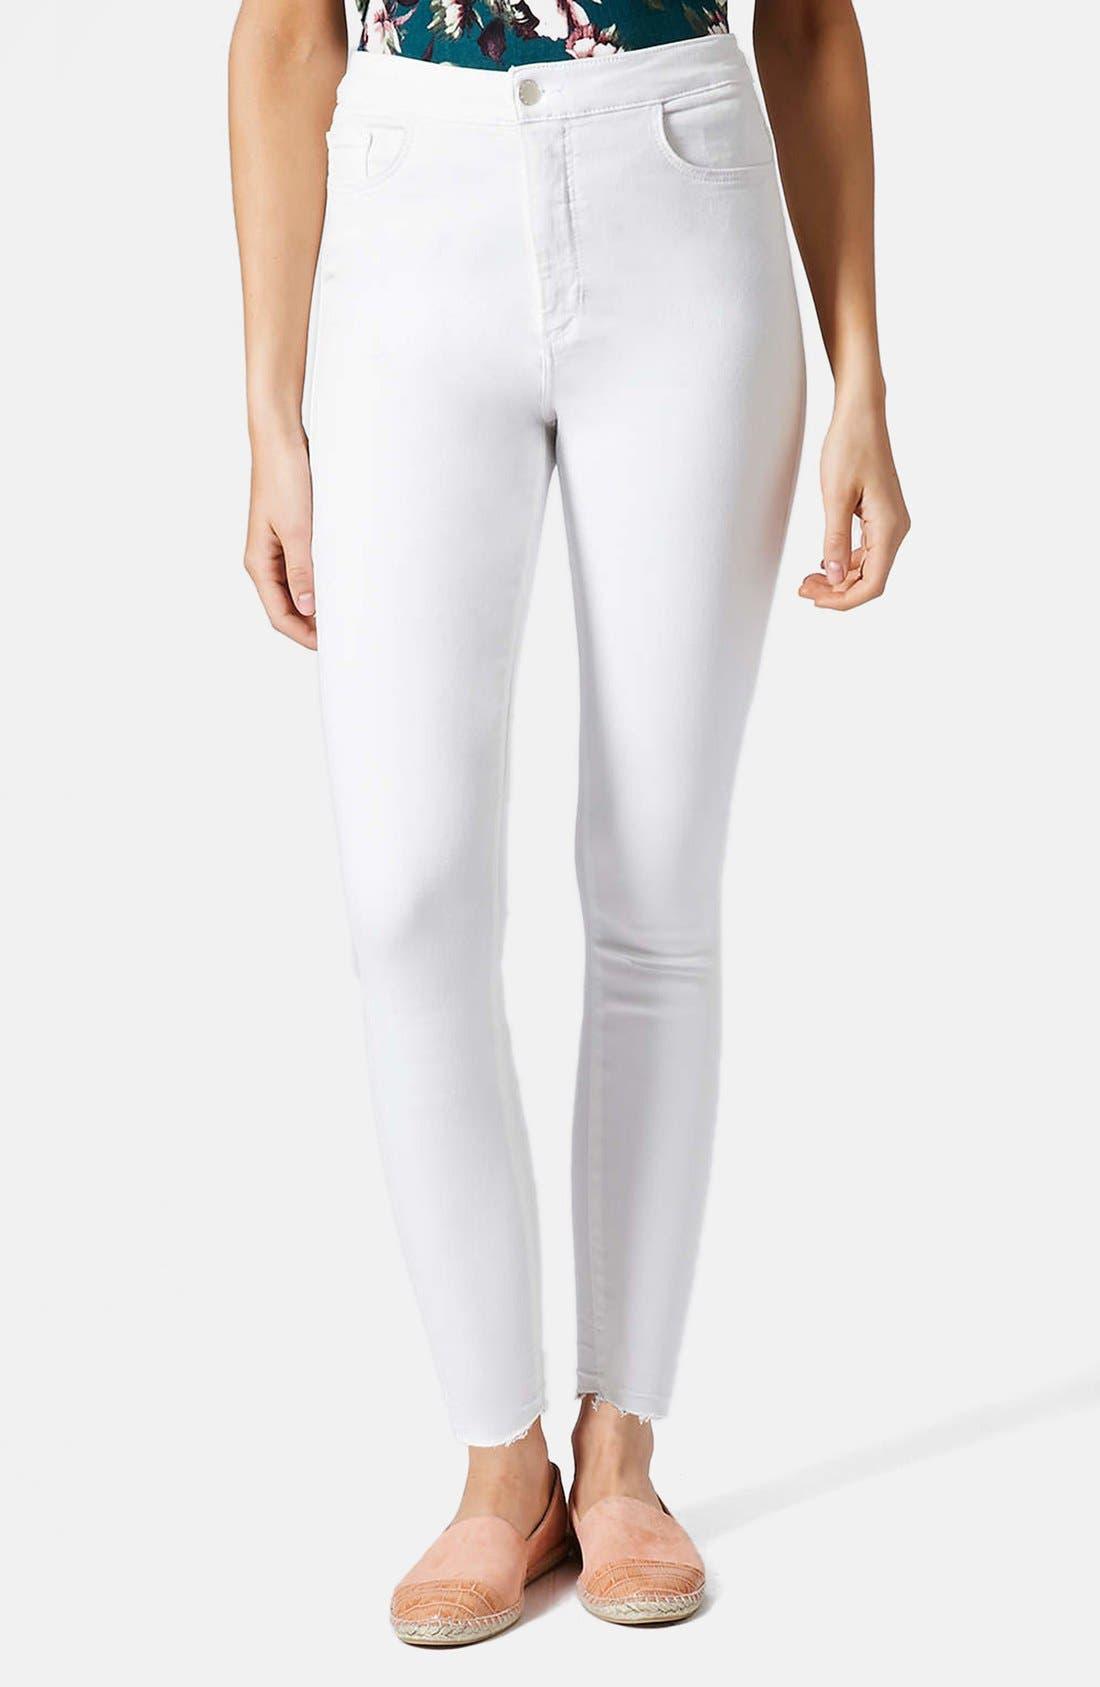 Alternate Image 1 Selected - Topshop Moto 'Joni' High Rise Crop Skinny Jeans (White)